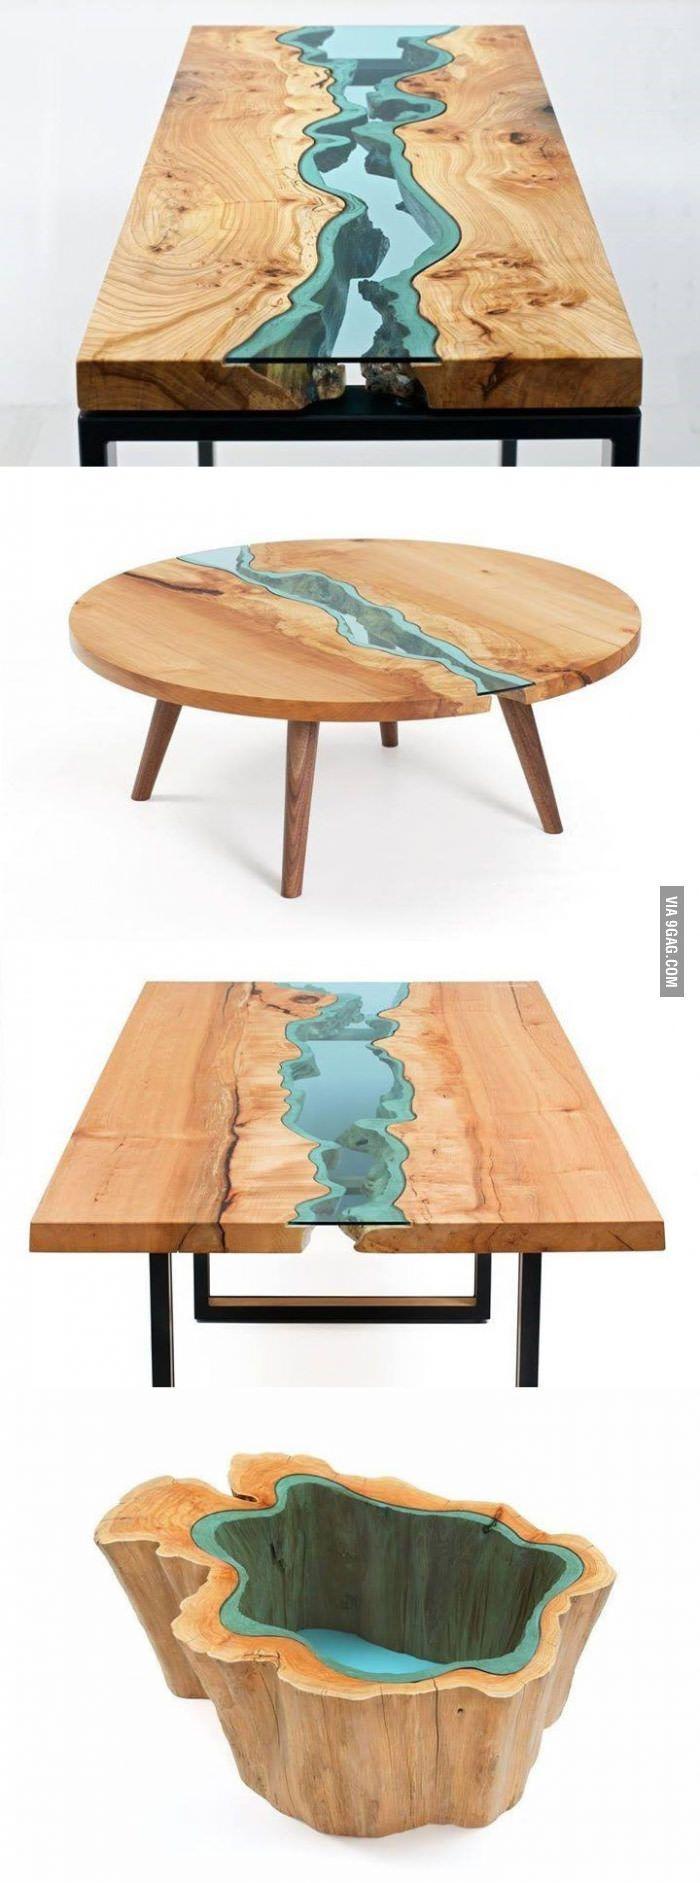 25 Best Ideas About Driftwood Table On Pinterest Driftwood Furniture Driftwood Art And